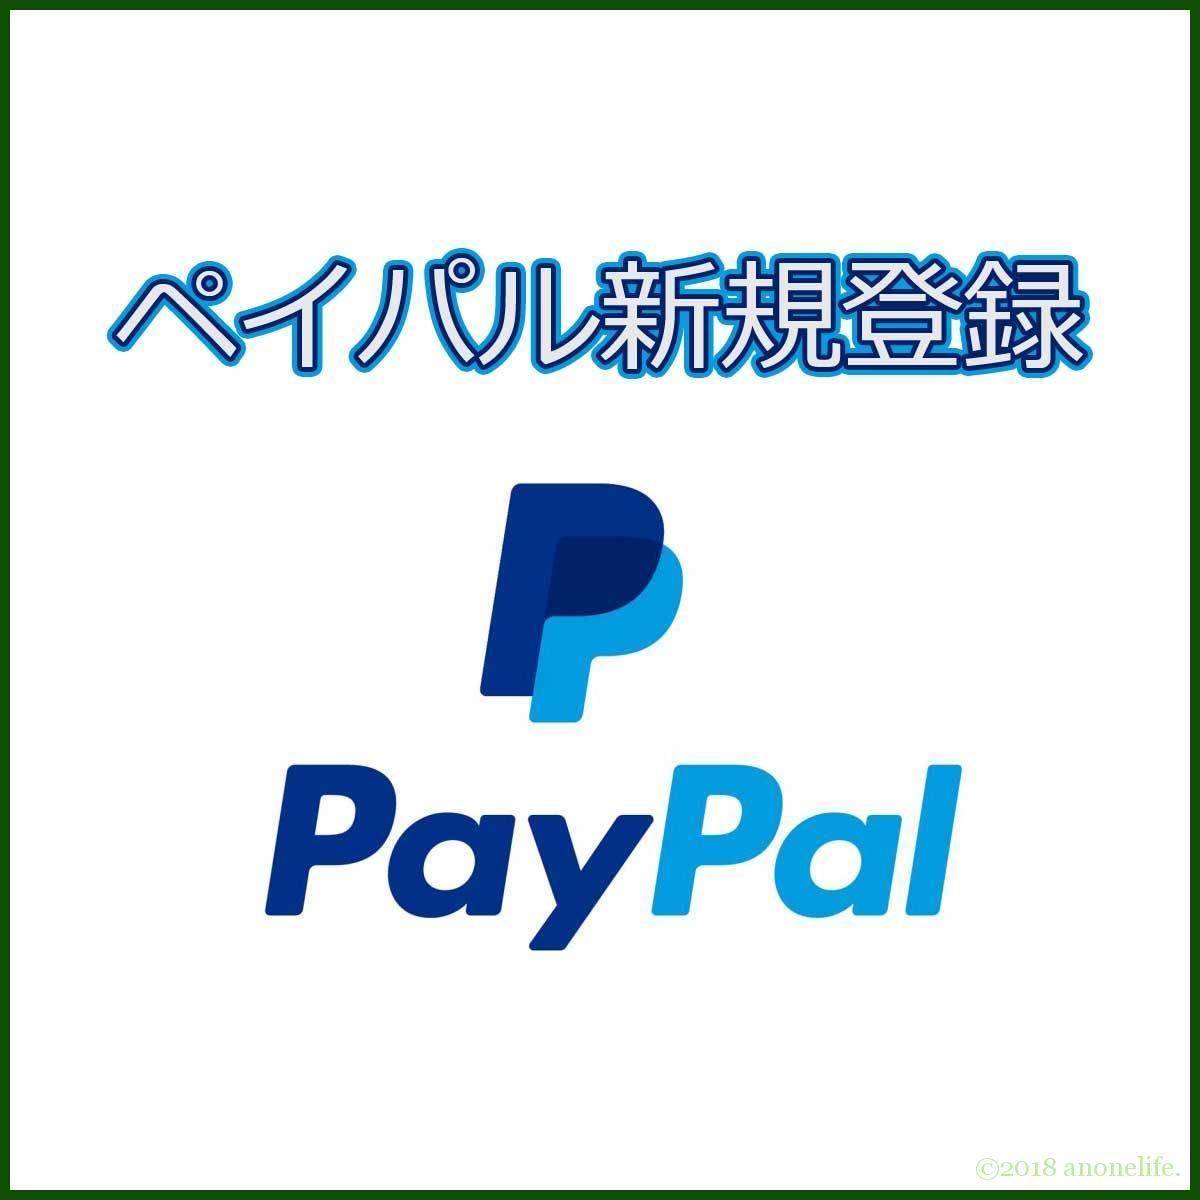 PayPal 新規登録